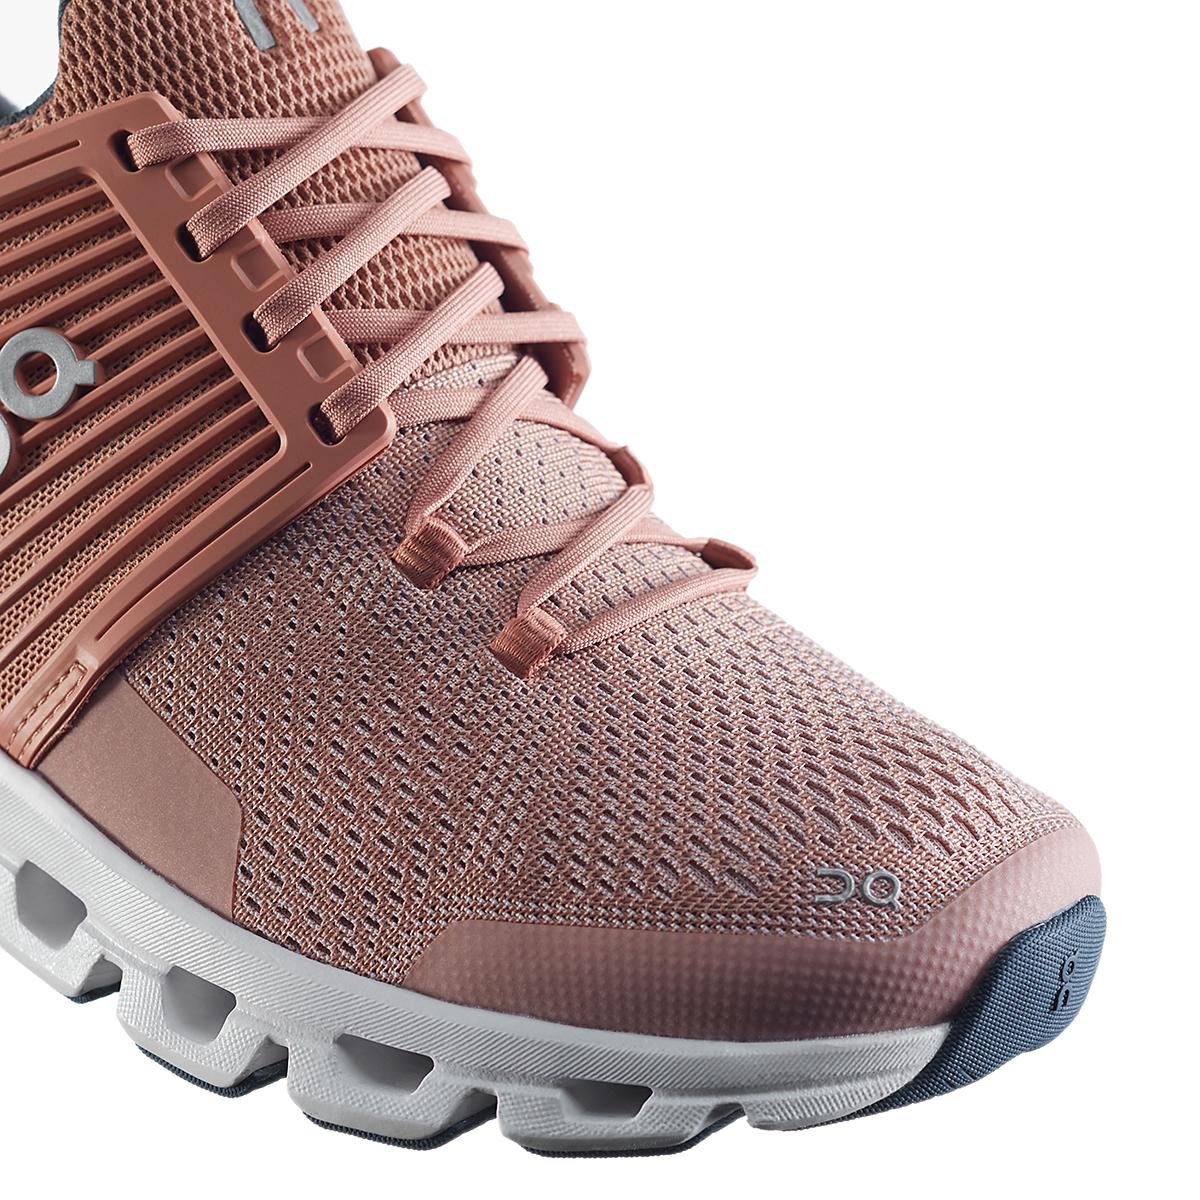 Women's On Cloudswift Running Shoe - Color: Blush/Denim - Size: 6 - Width: Regular, Blush/Denim, large, image 2